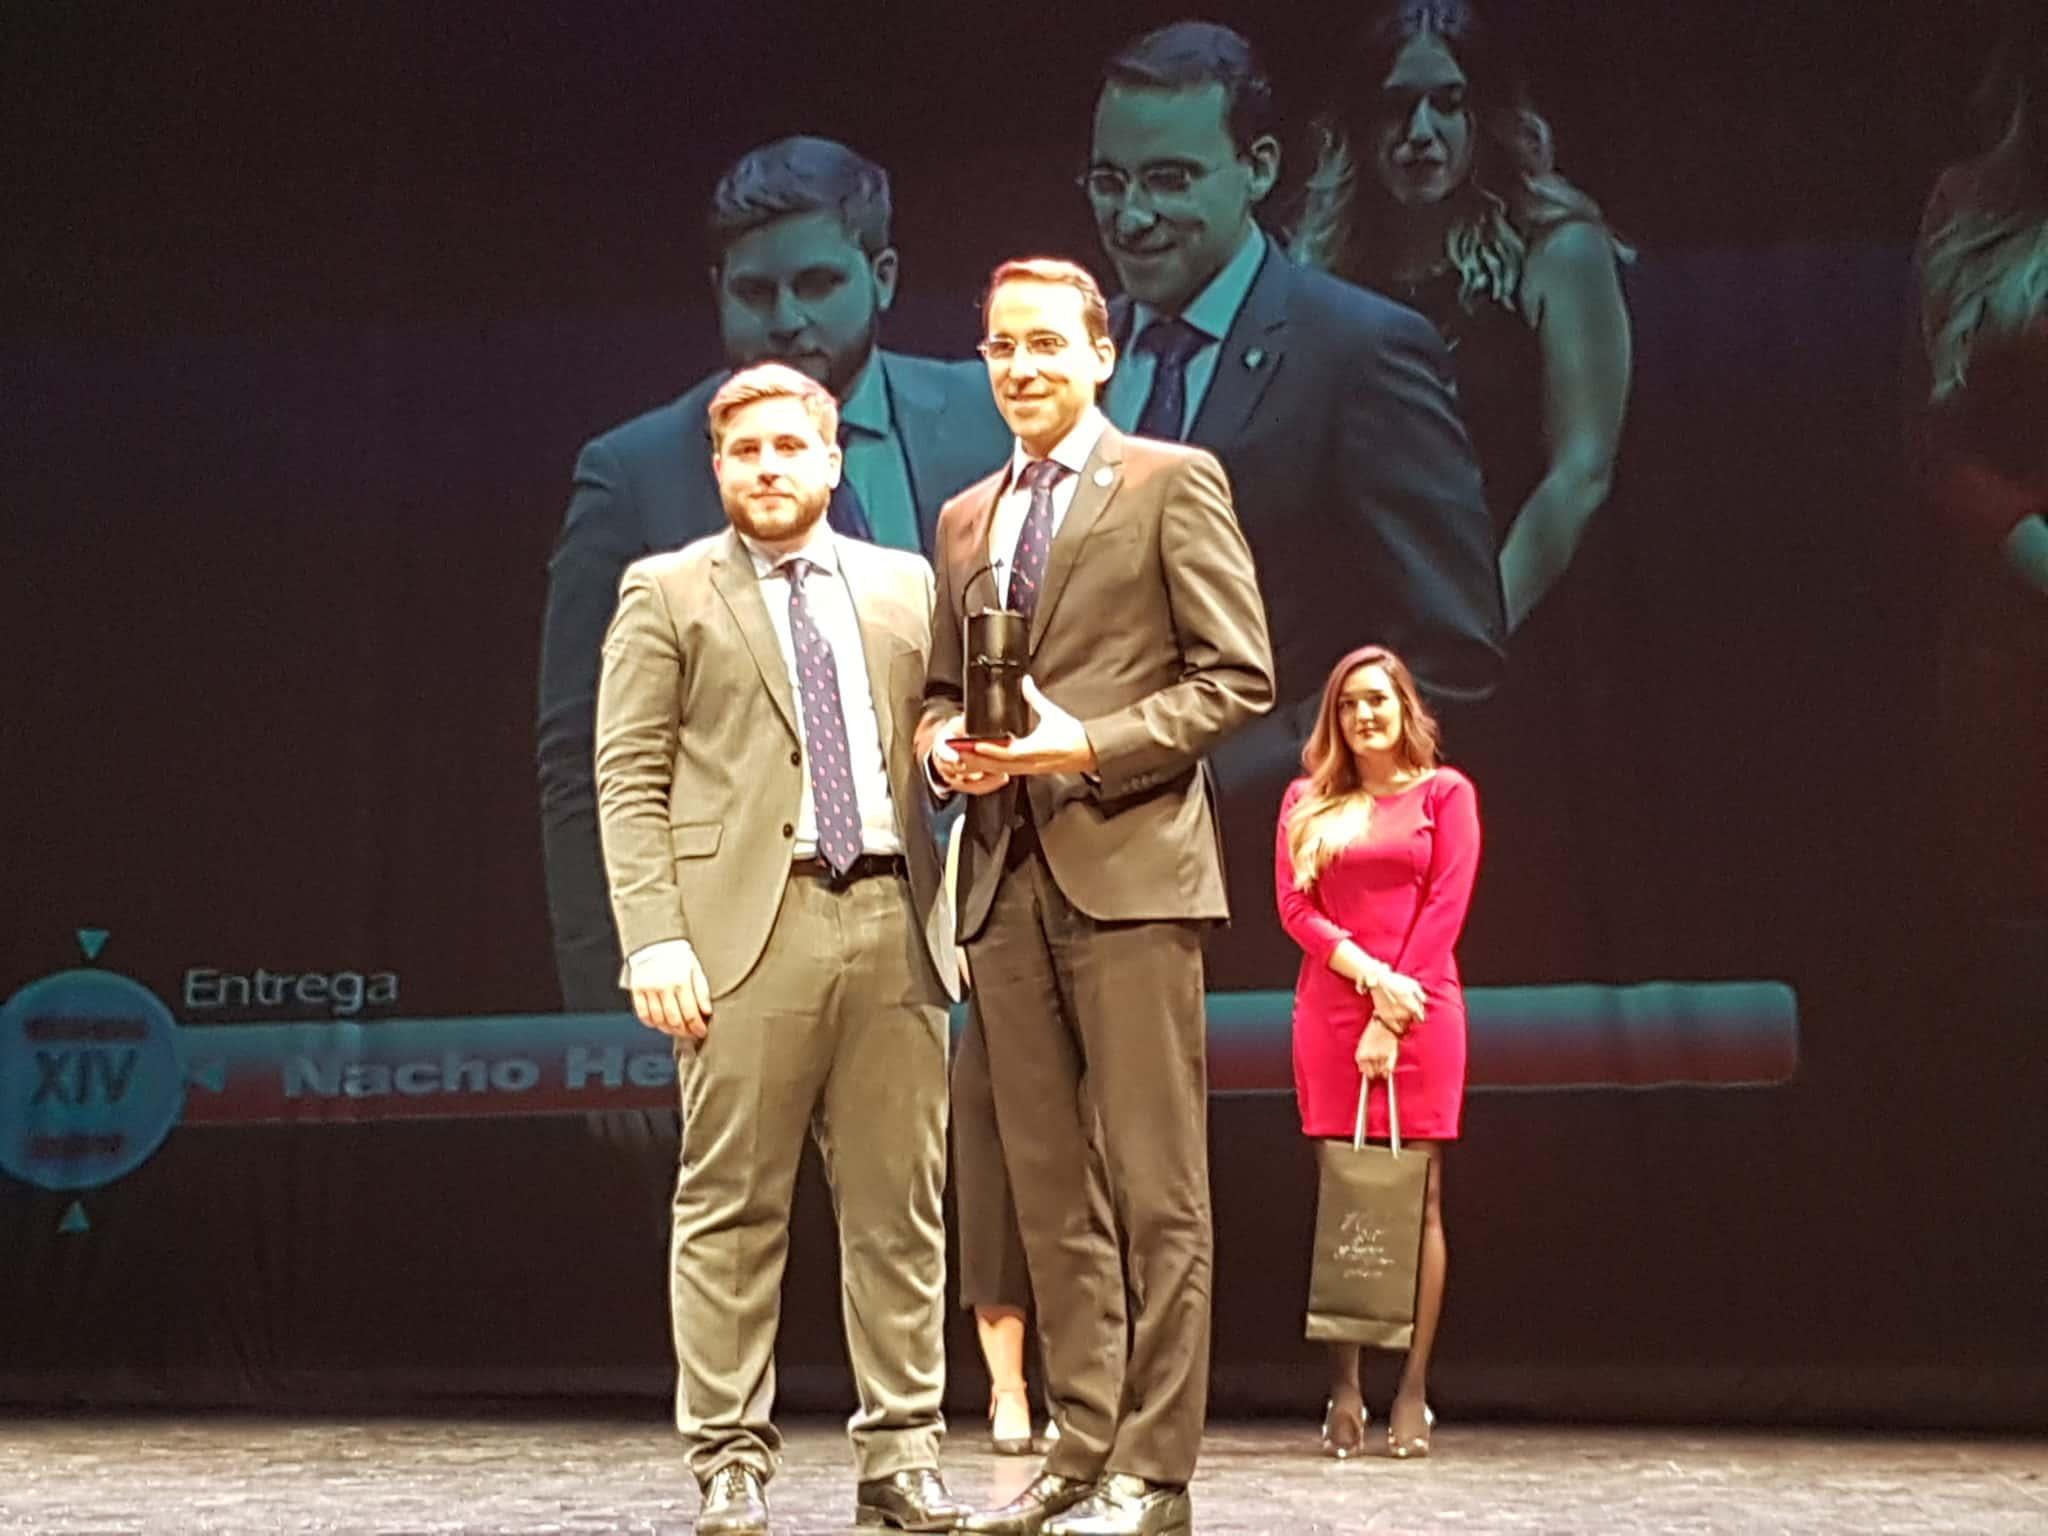 https://blog.globalcaja.es/wp-content/uploads/2017/11/Premios-IMASTV.jpg